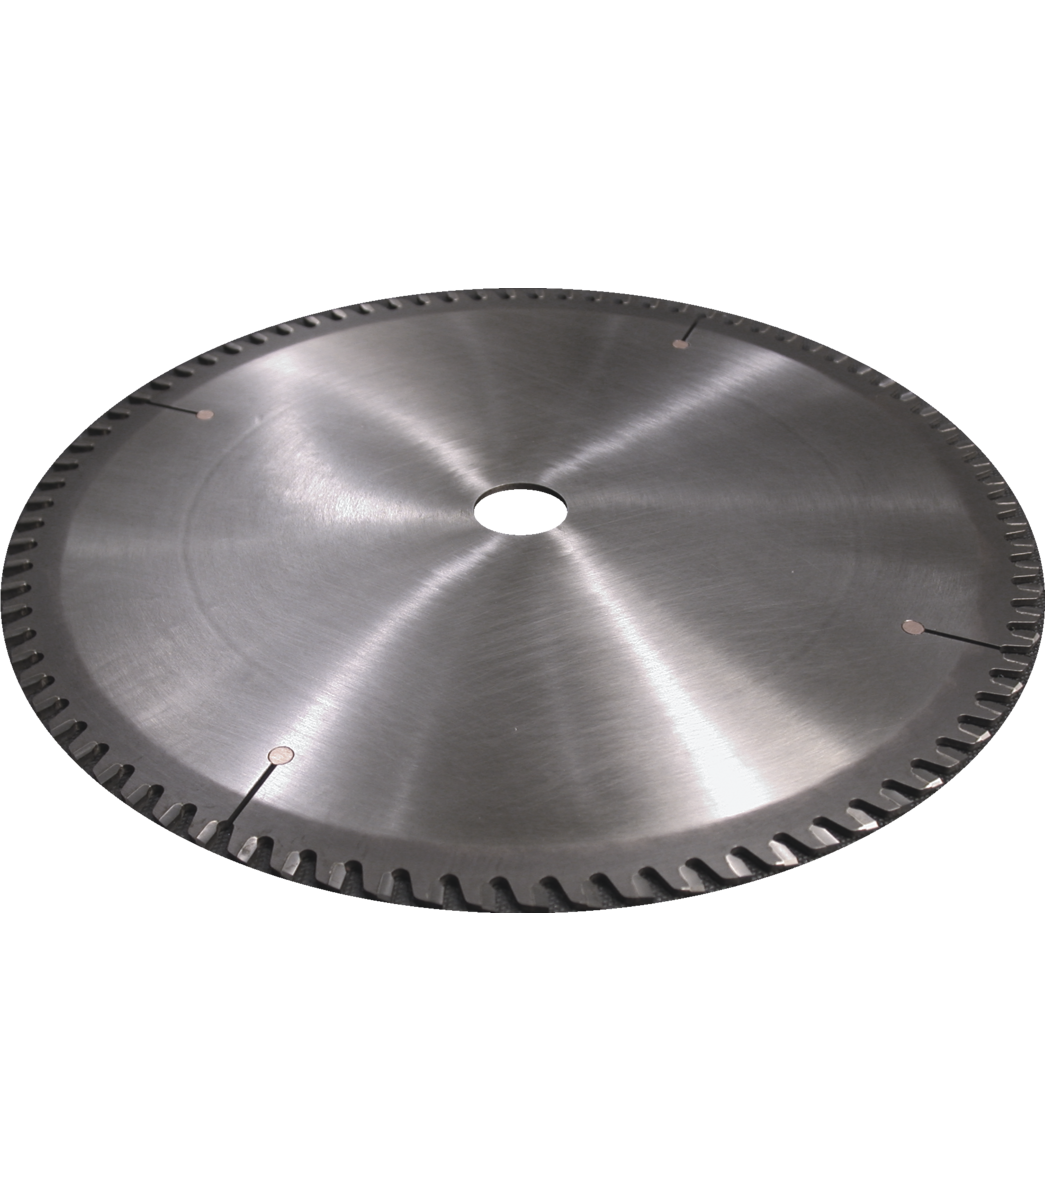 Non-Ferrous Circular Saw Blade 350mm x 32mm x 2.5mm x 180T For J-CK350-2/4K